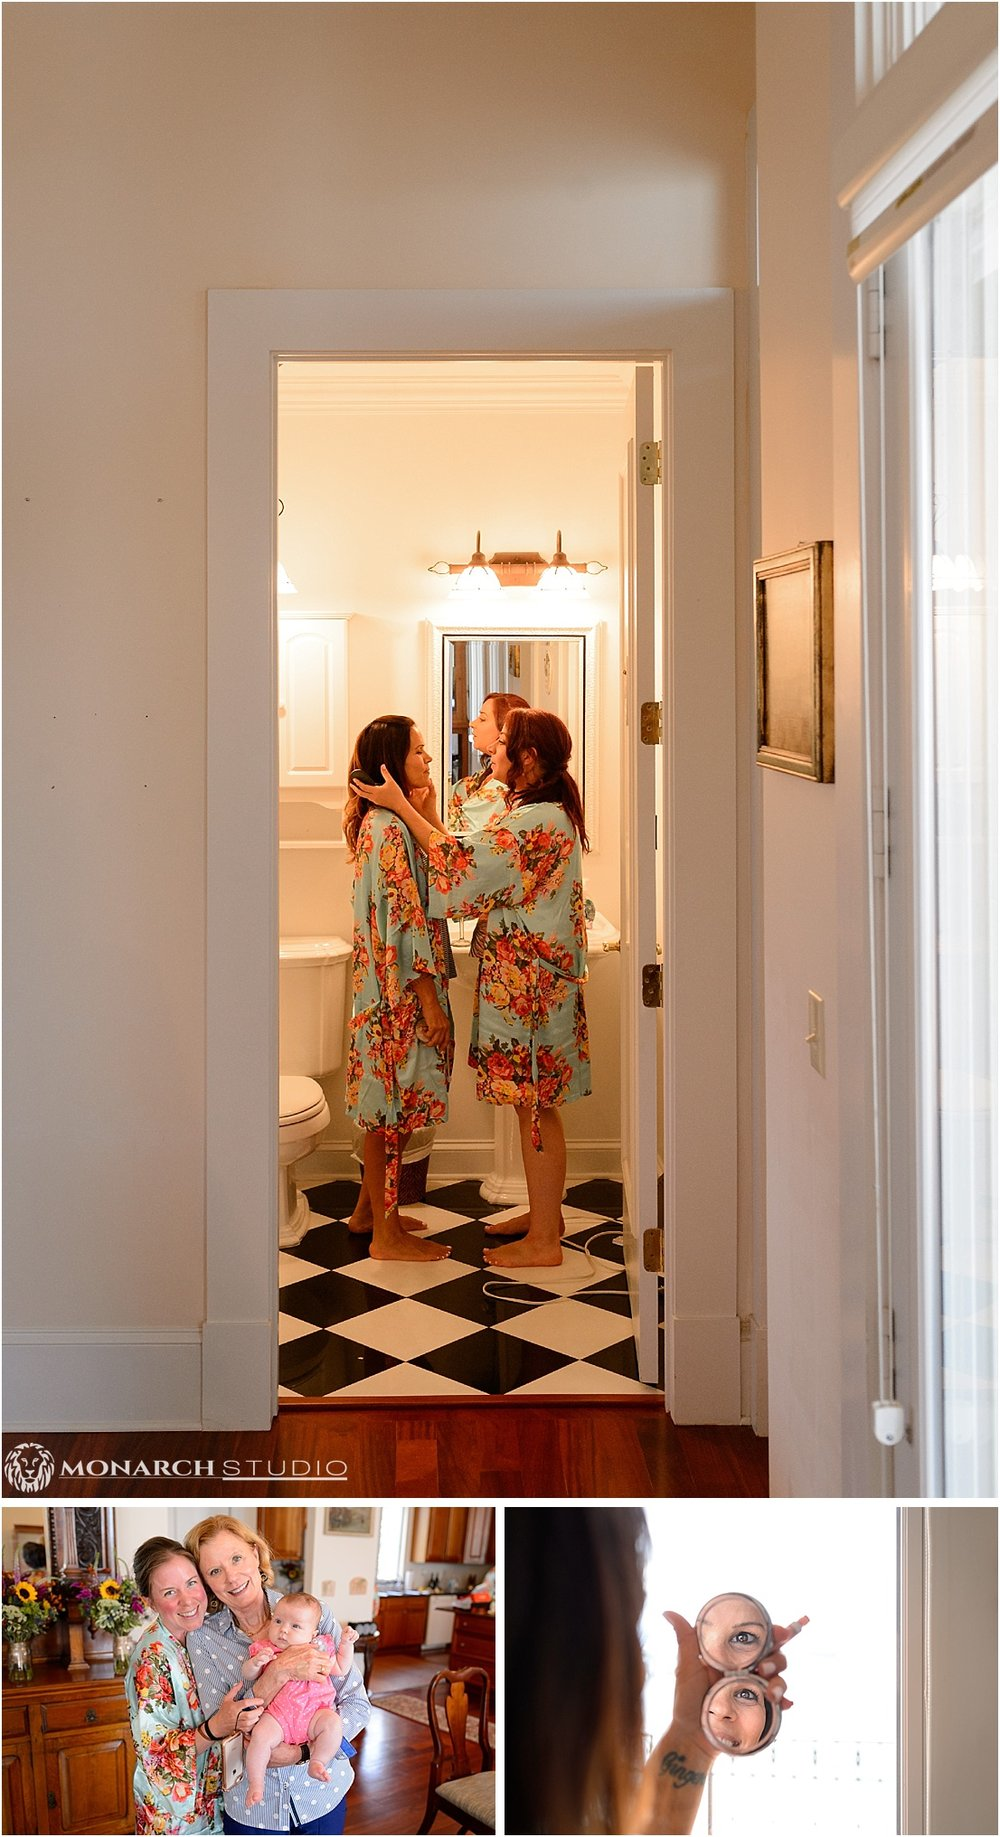 whiteroom-st-augustine-photographer-007.jpg